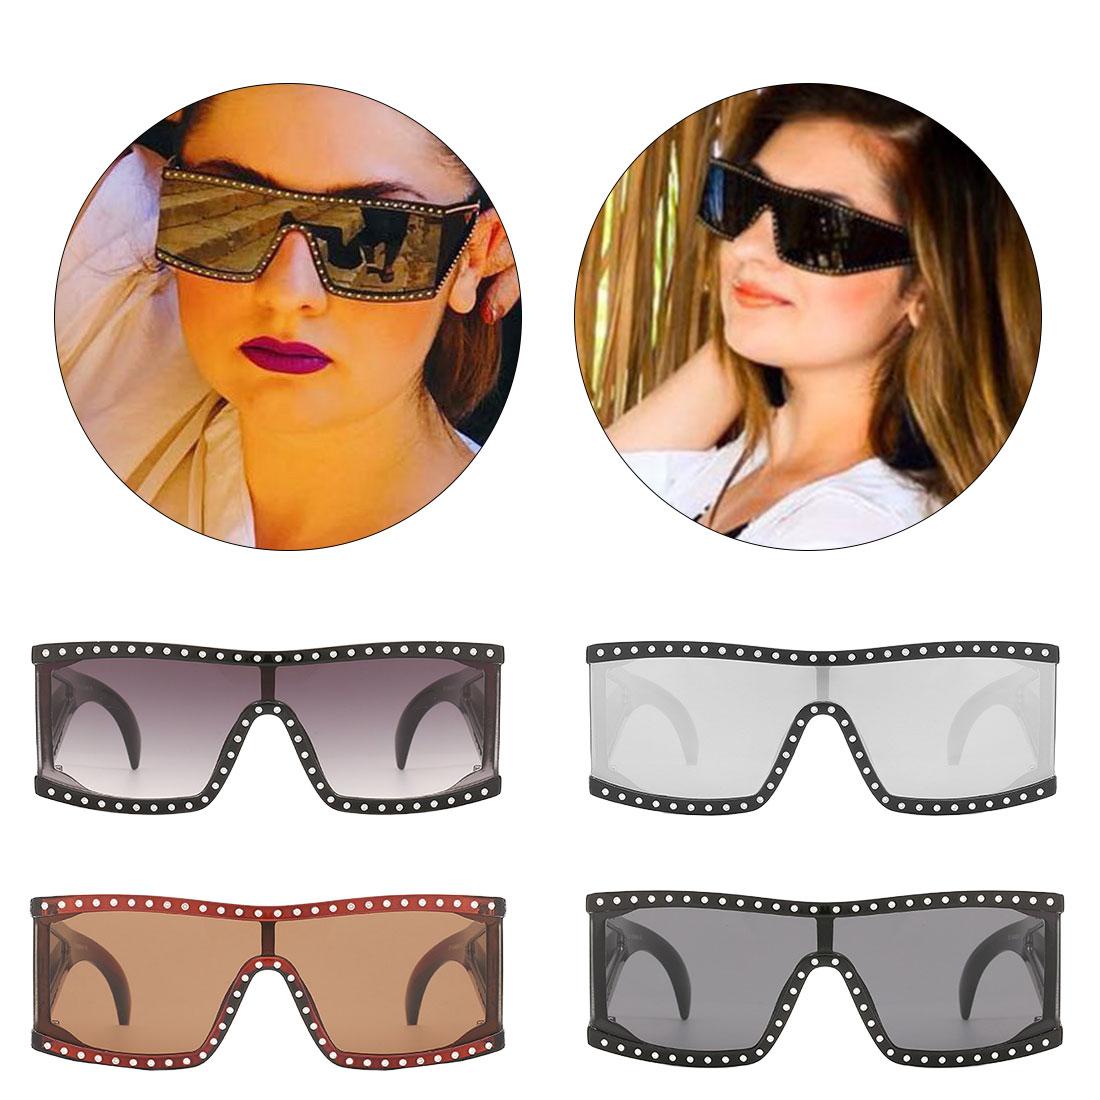 Vintage Retro Crystal Diamond Sun Glasses Women Luxury Female Sunwear Clear Lens Gafas Feminino Diamond big box sunglasses in Women 39 s Sunglasses from Apparel Accessories